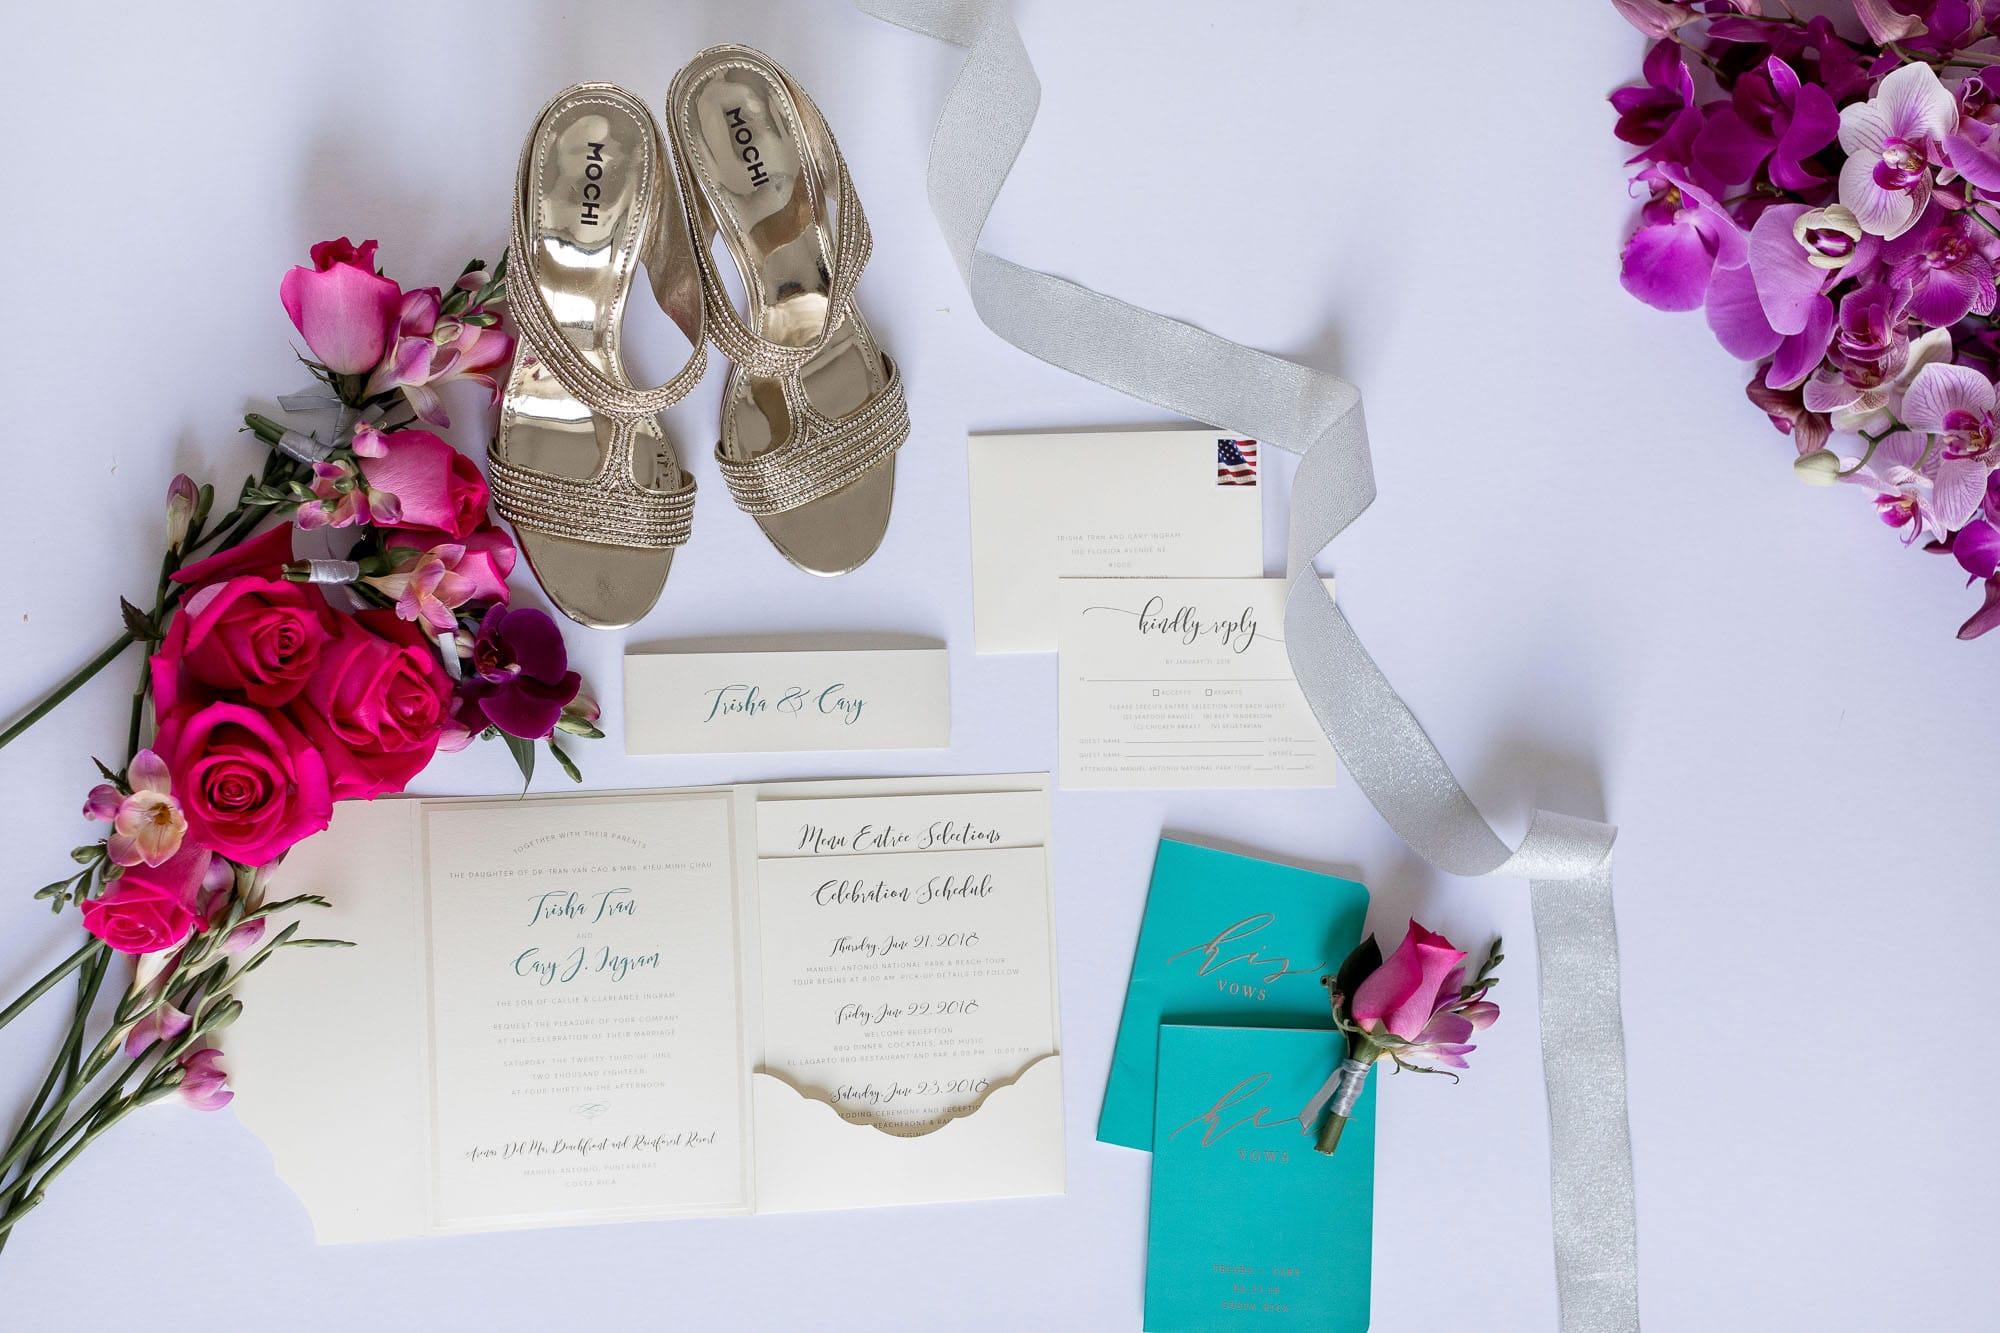 Elegant wedding shoes and invitations